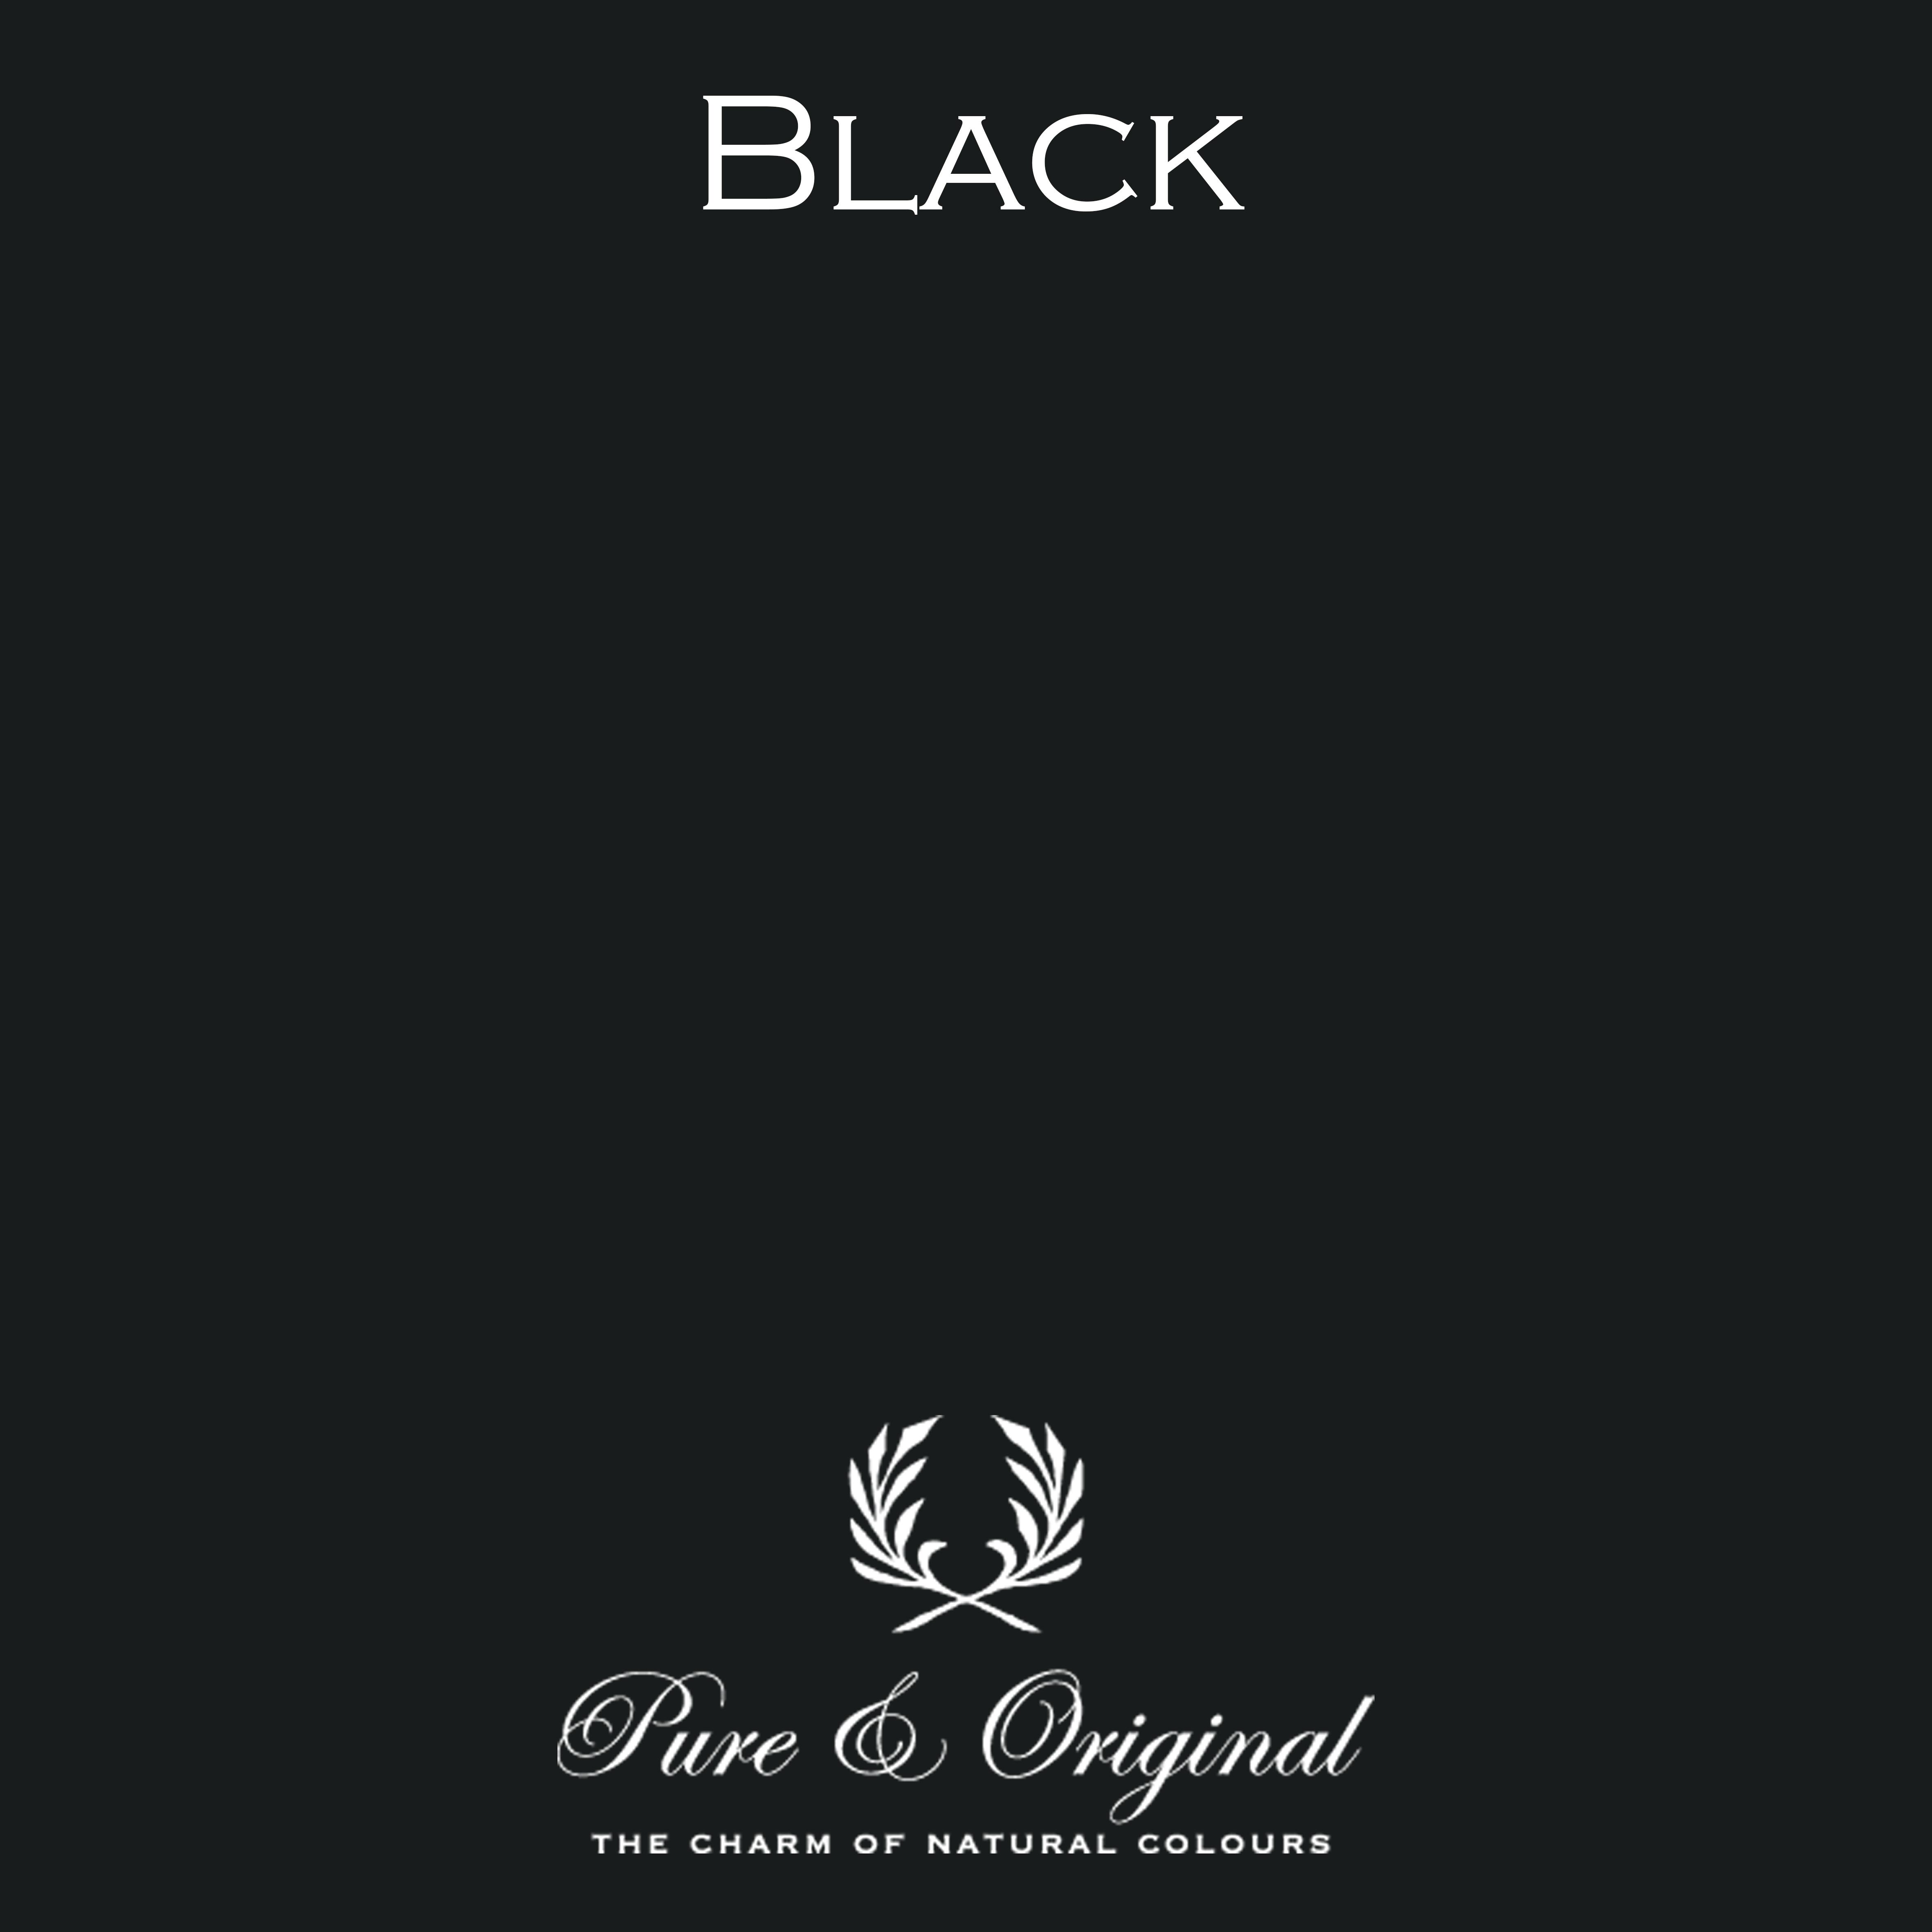 Kulör Black, Classico kritfärg